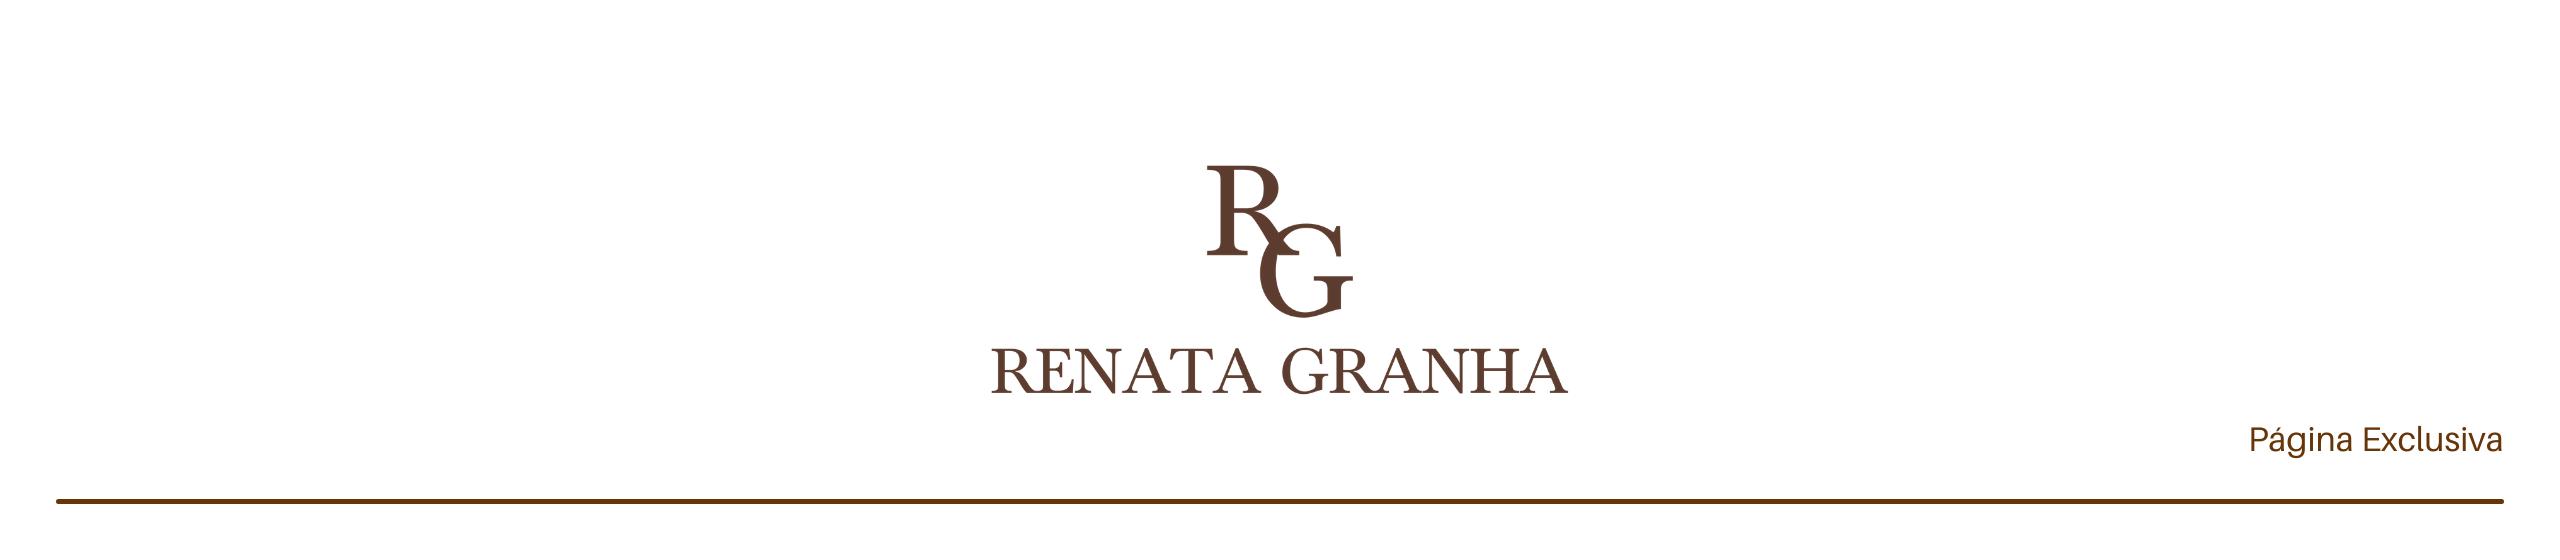 Banner Renata Granha